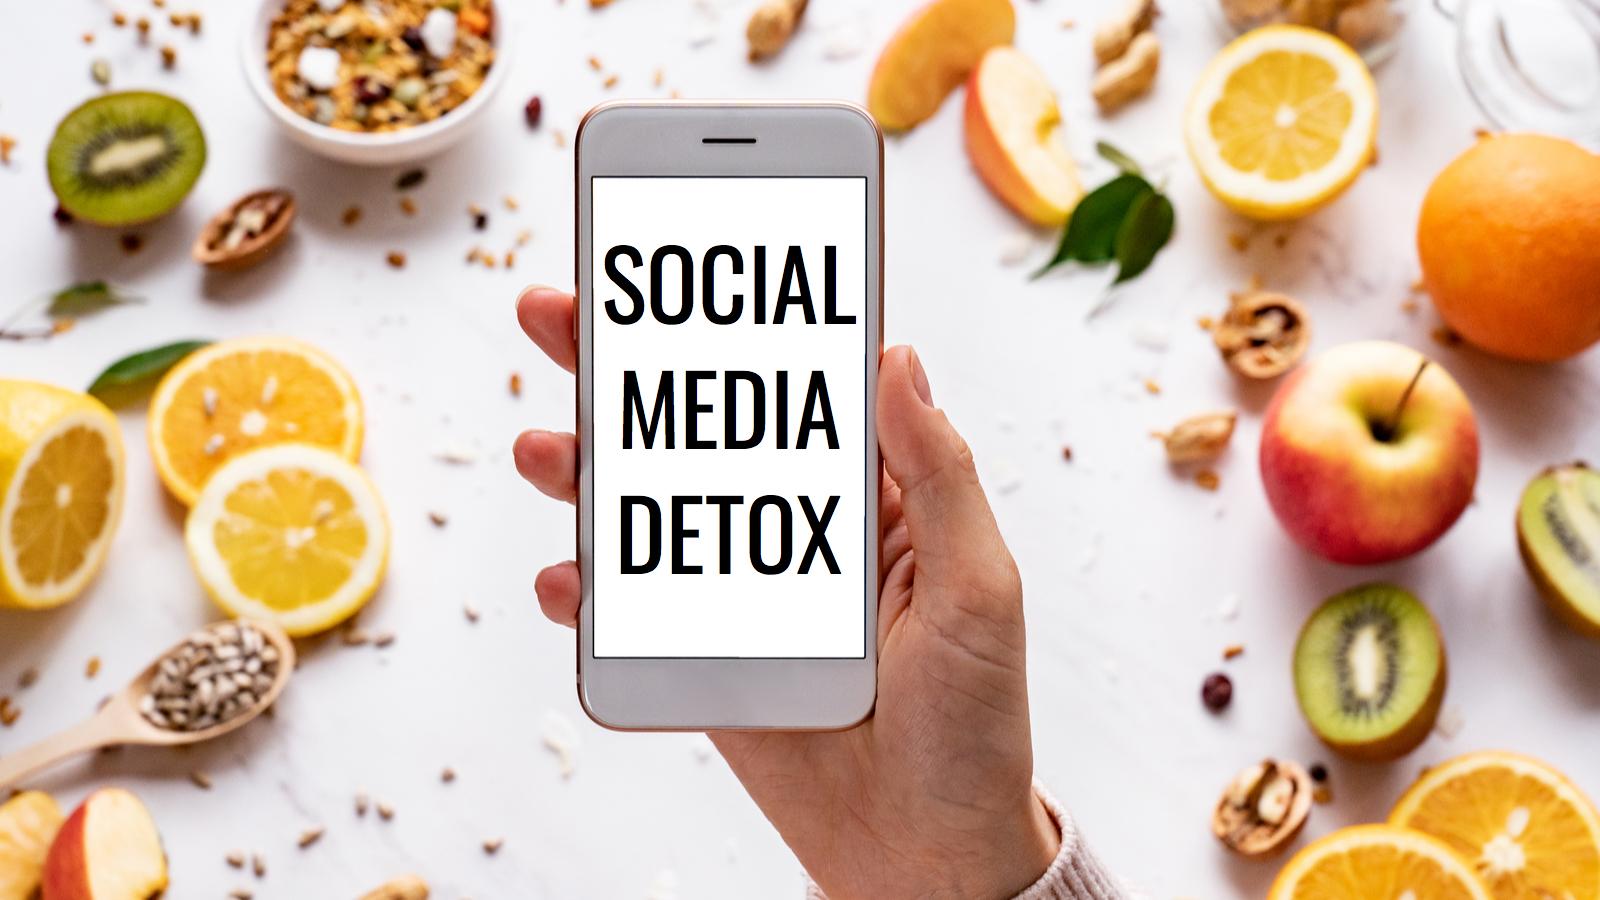 have-you-tried-social-media-detox-fasting